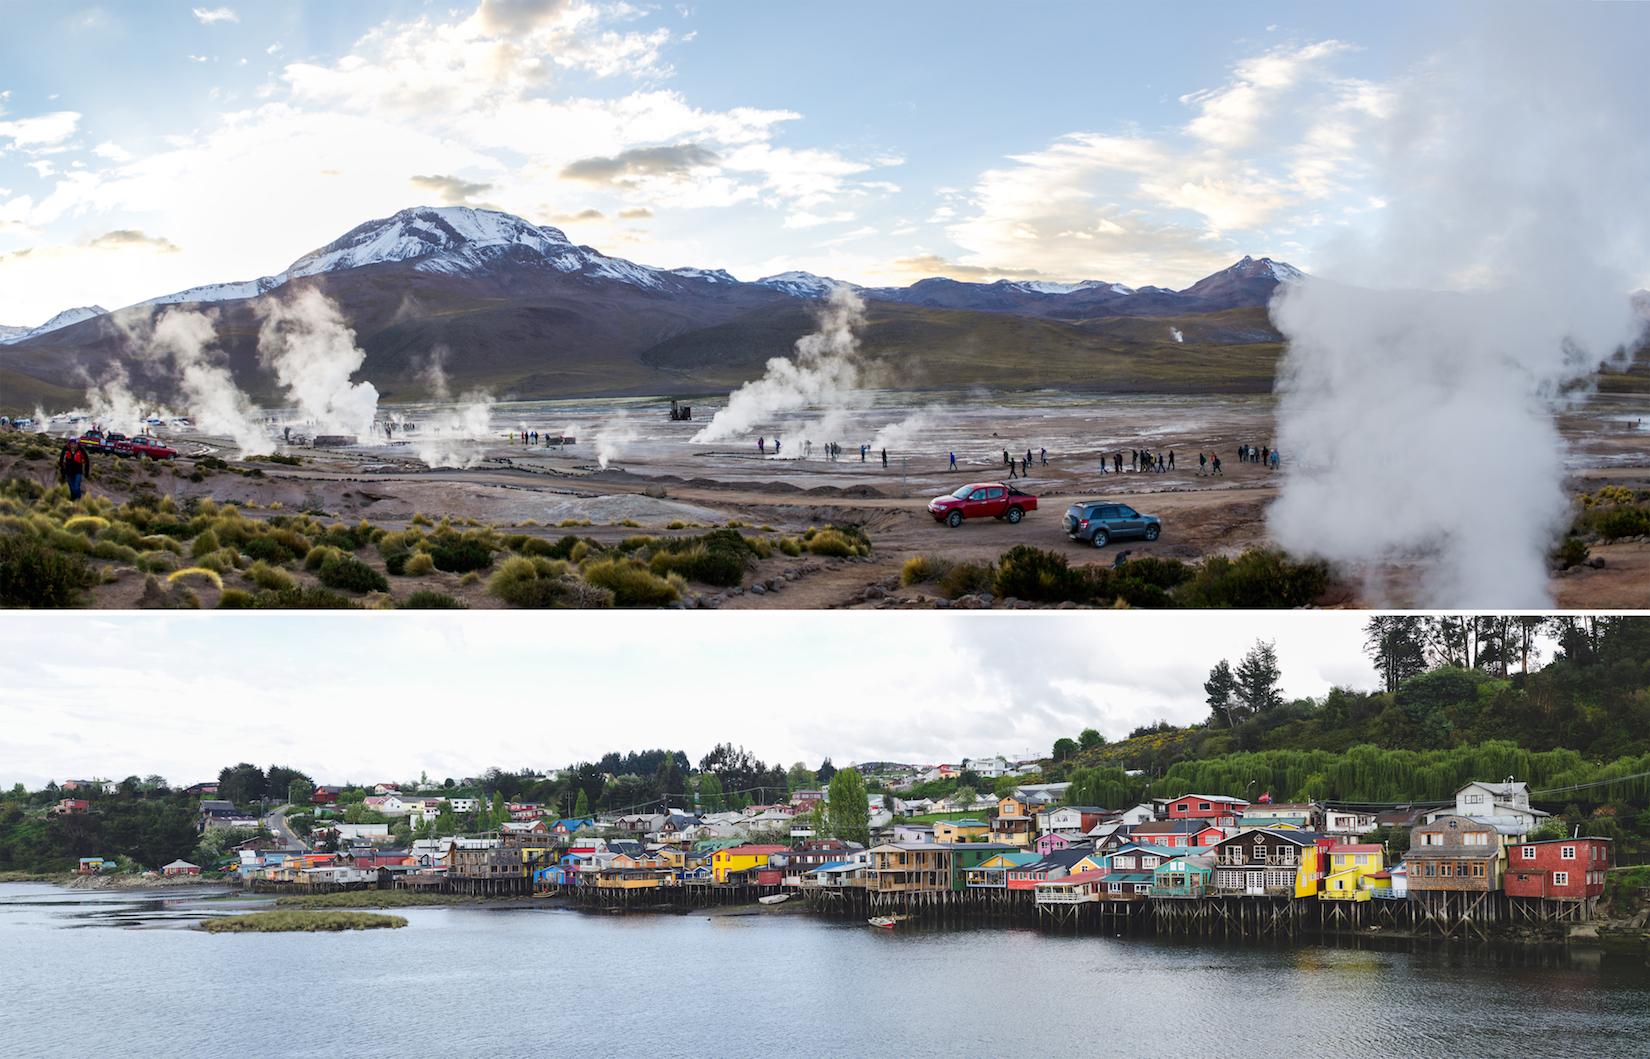 Tatio Geysers in the Atacama Desert (above) // Castro, the capital city of the island of Chiloé